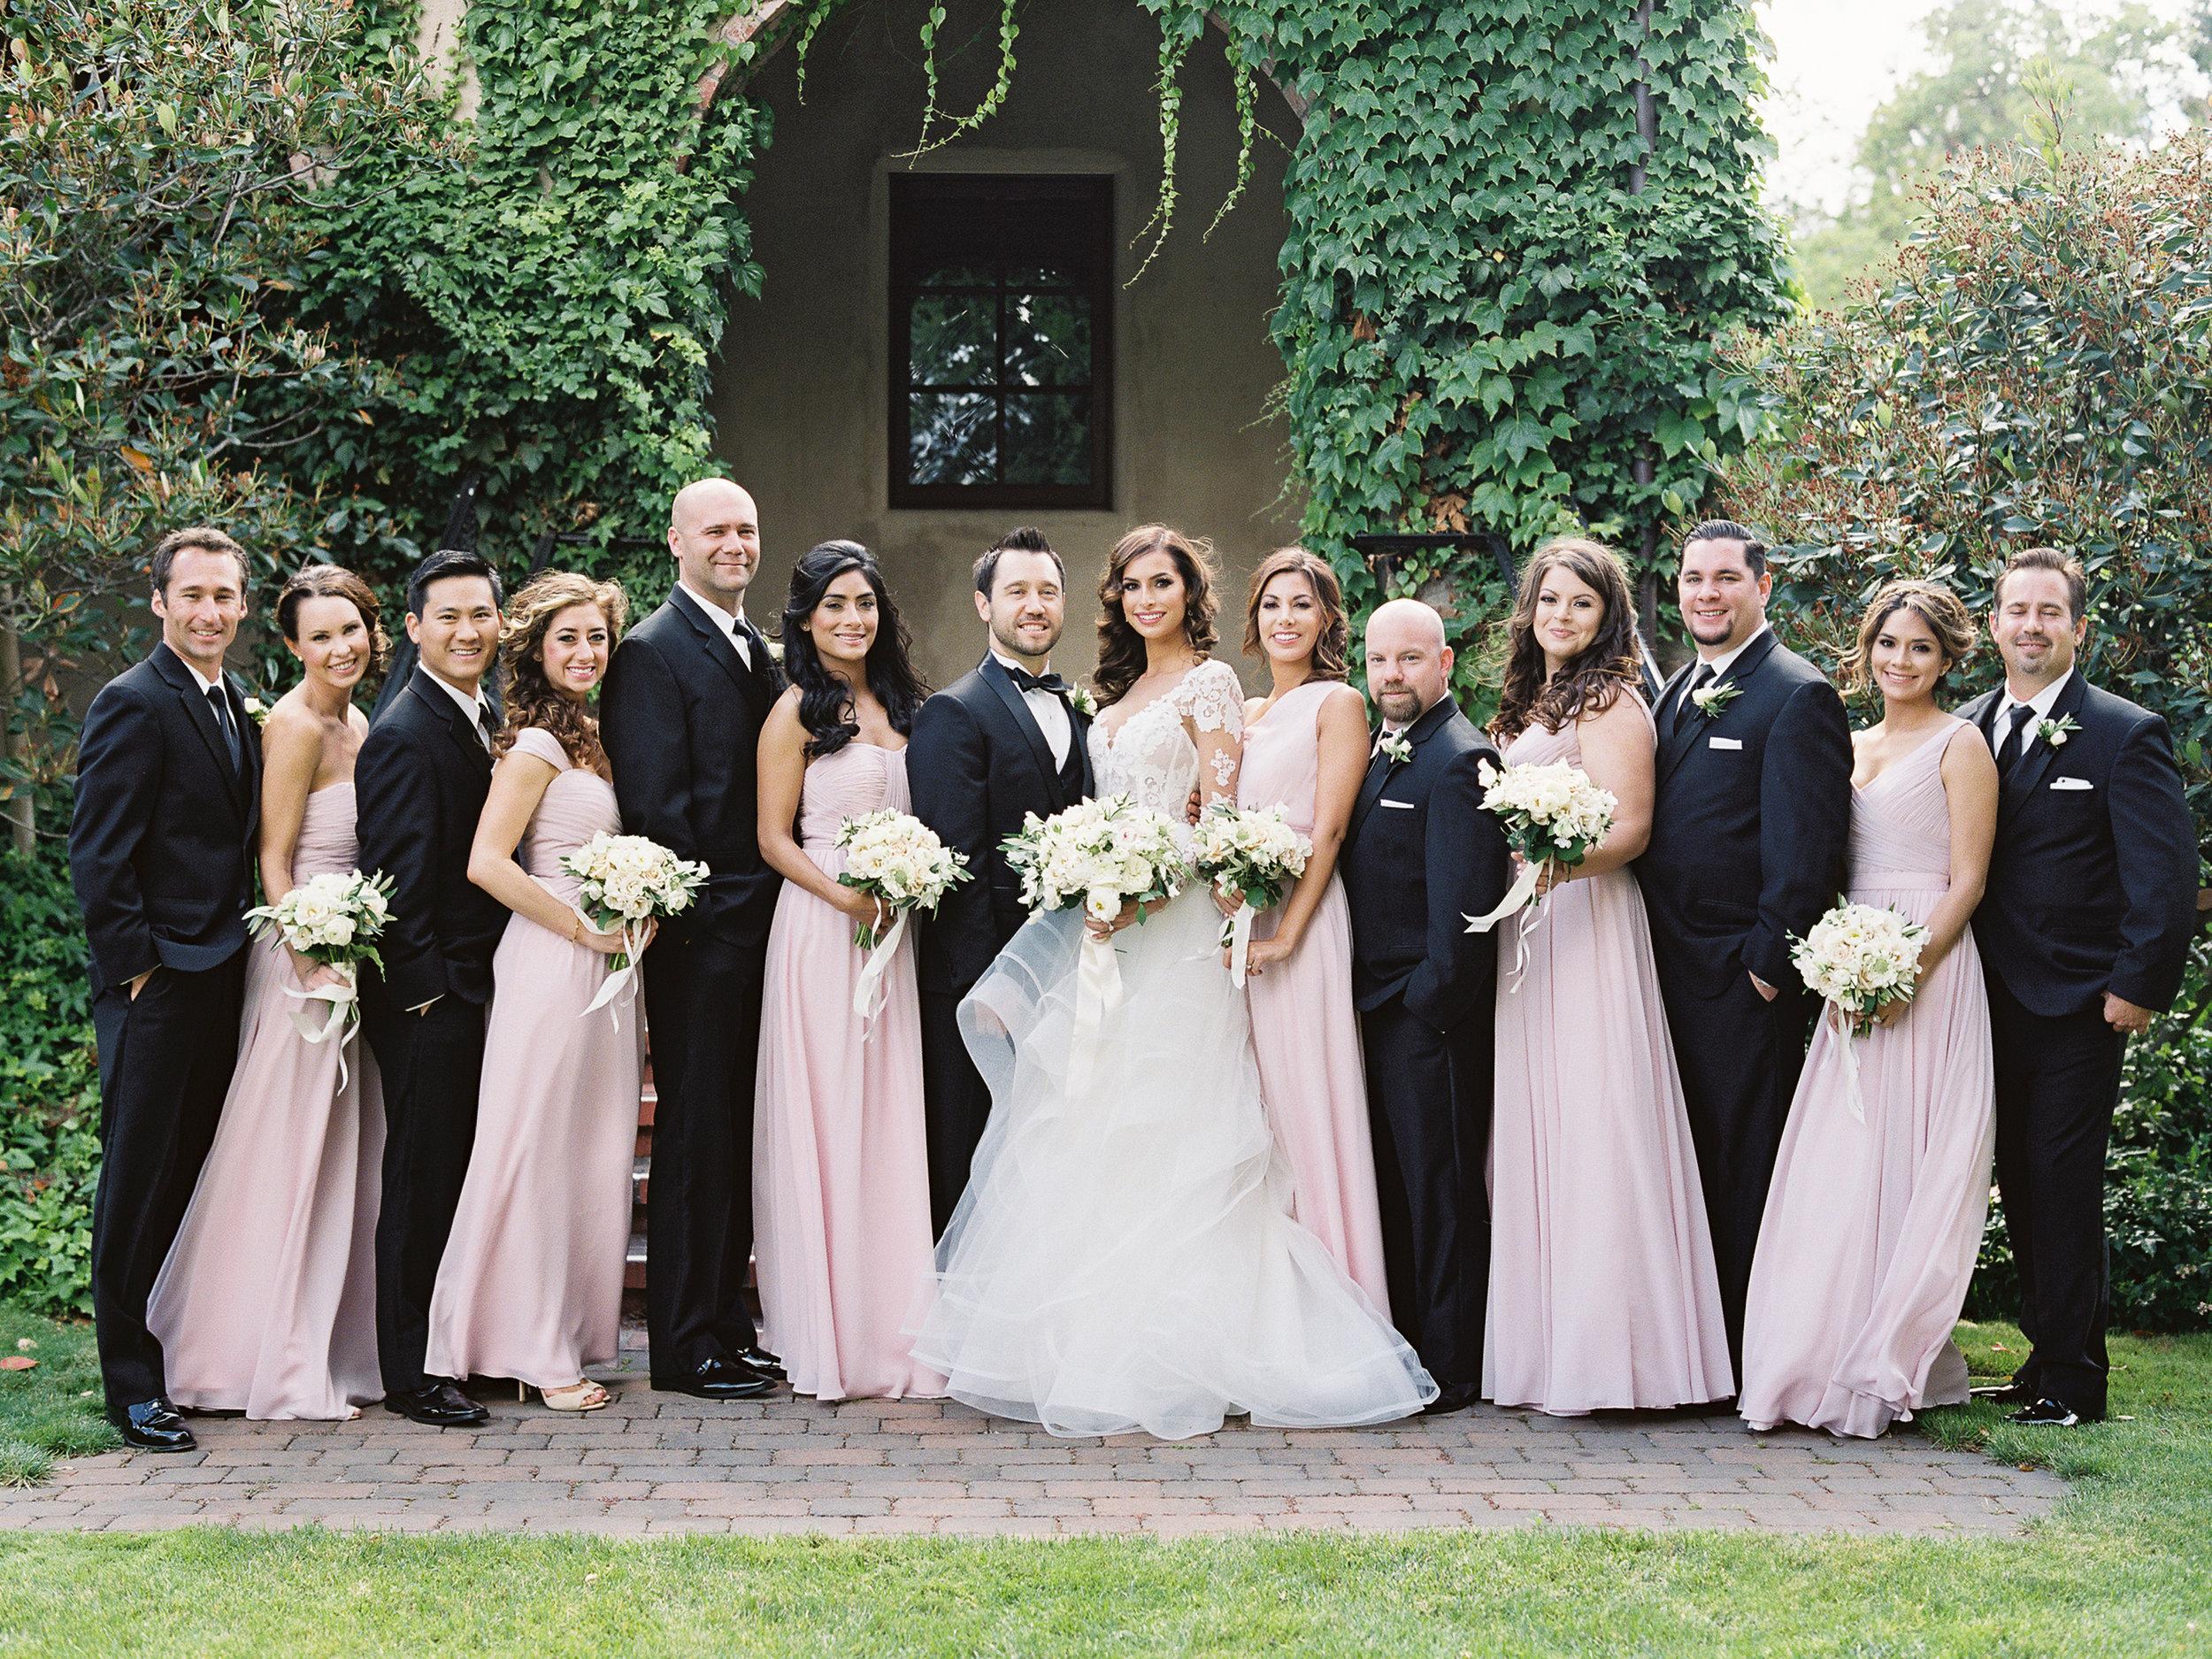 Meghan Mehan Photography   Fine Art Film Wedding Photographer   California   San Francisco   Napa   Sonoma   Santa Barbara   Big Sur   Destination Wedding Photographer 030.jpg